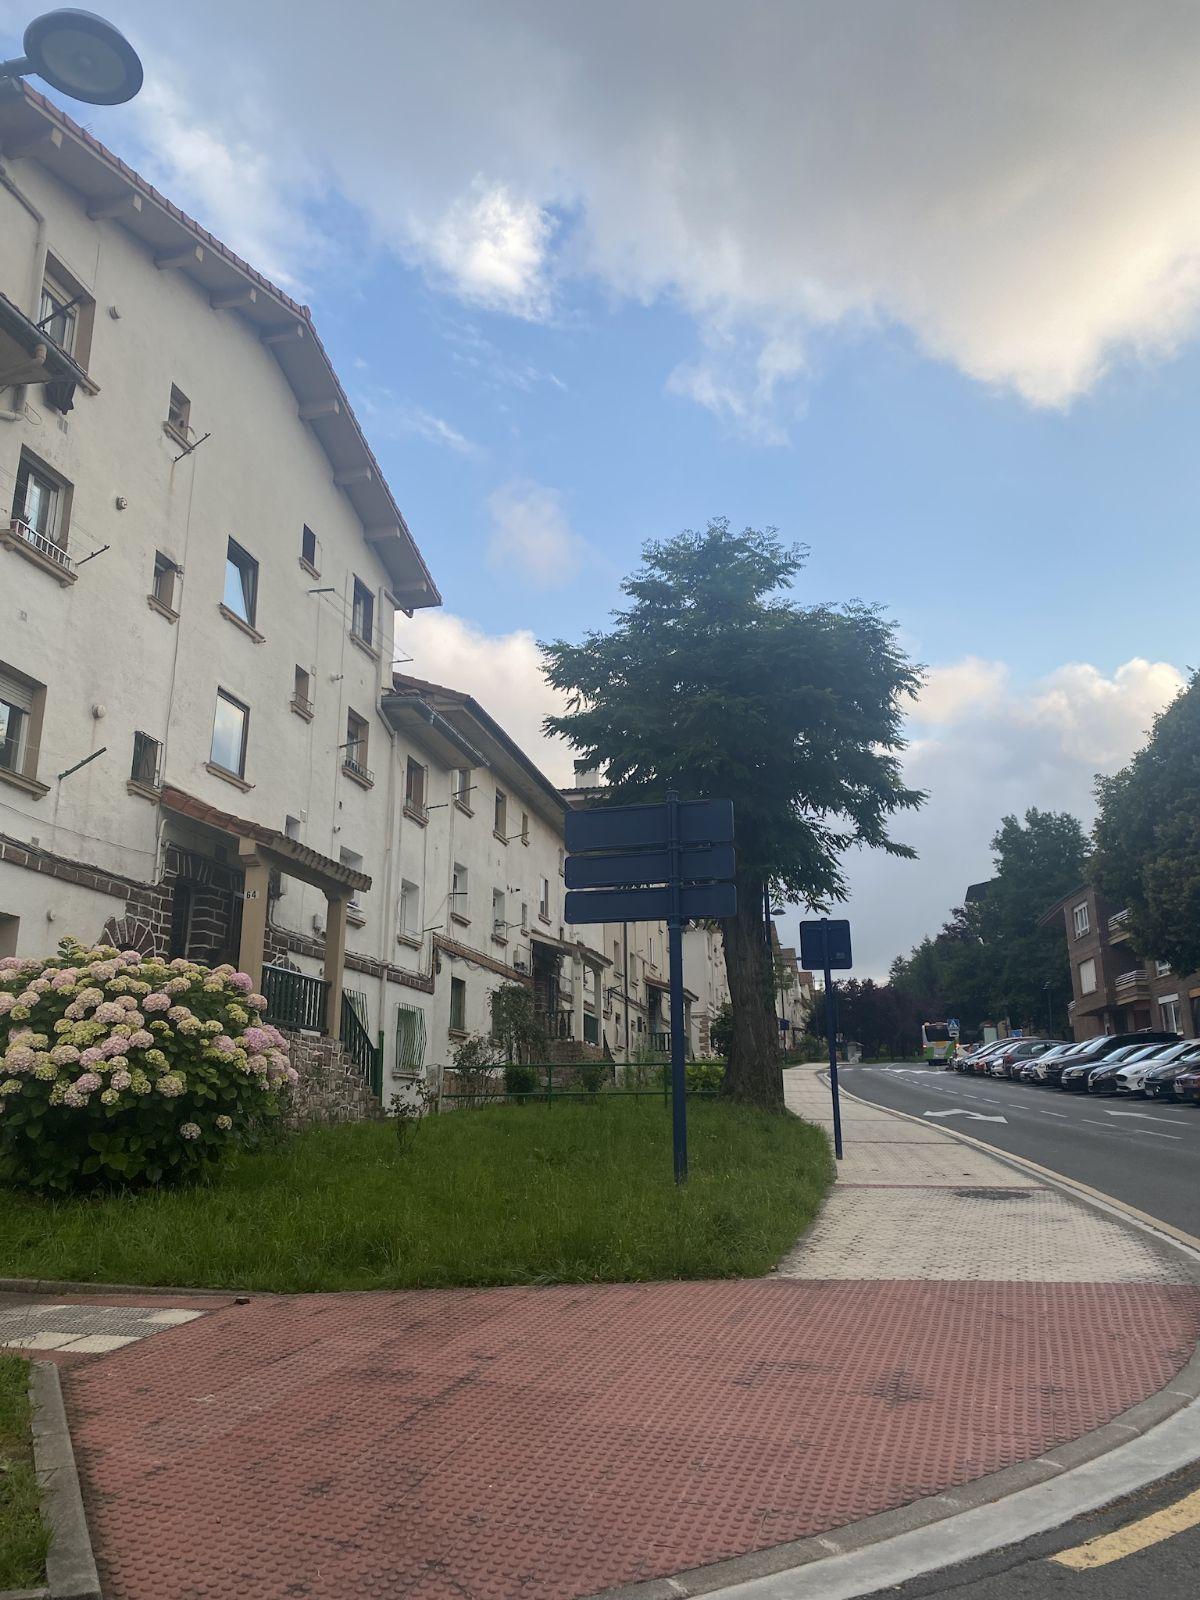 Piso en venta en Alaberga, Errenteria, Guipúzcoa, Barrio Alaberga Auzoa, 170.000 €, 2 habitaciones, 1 baño, 73 m2